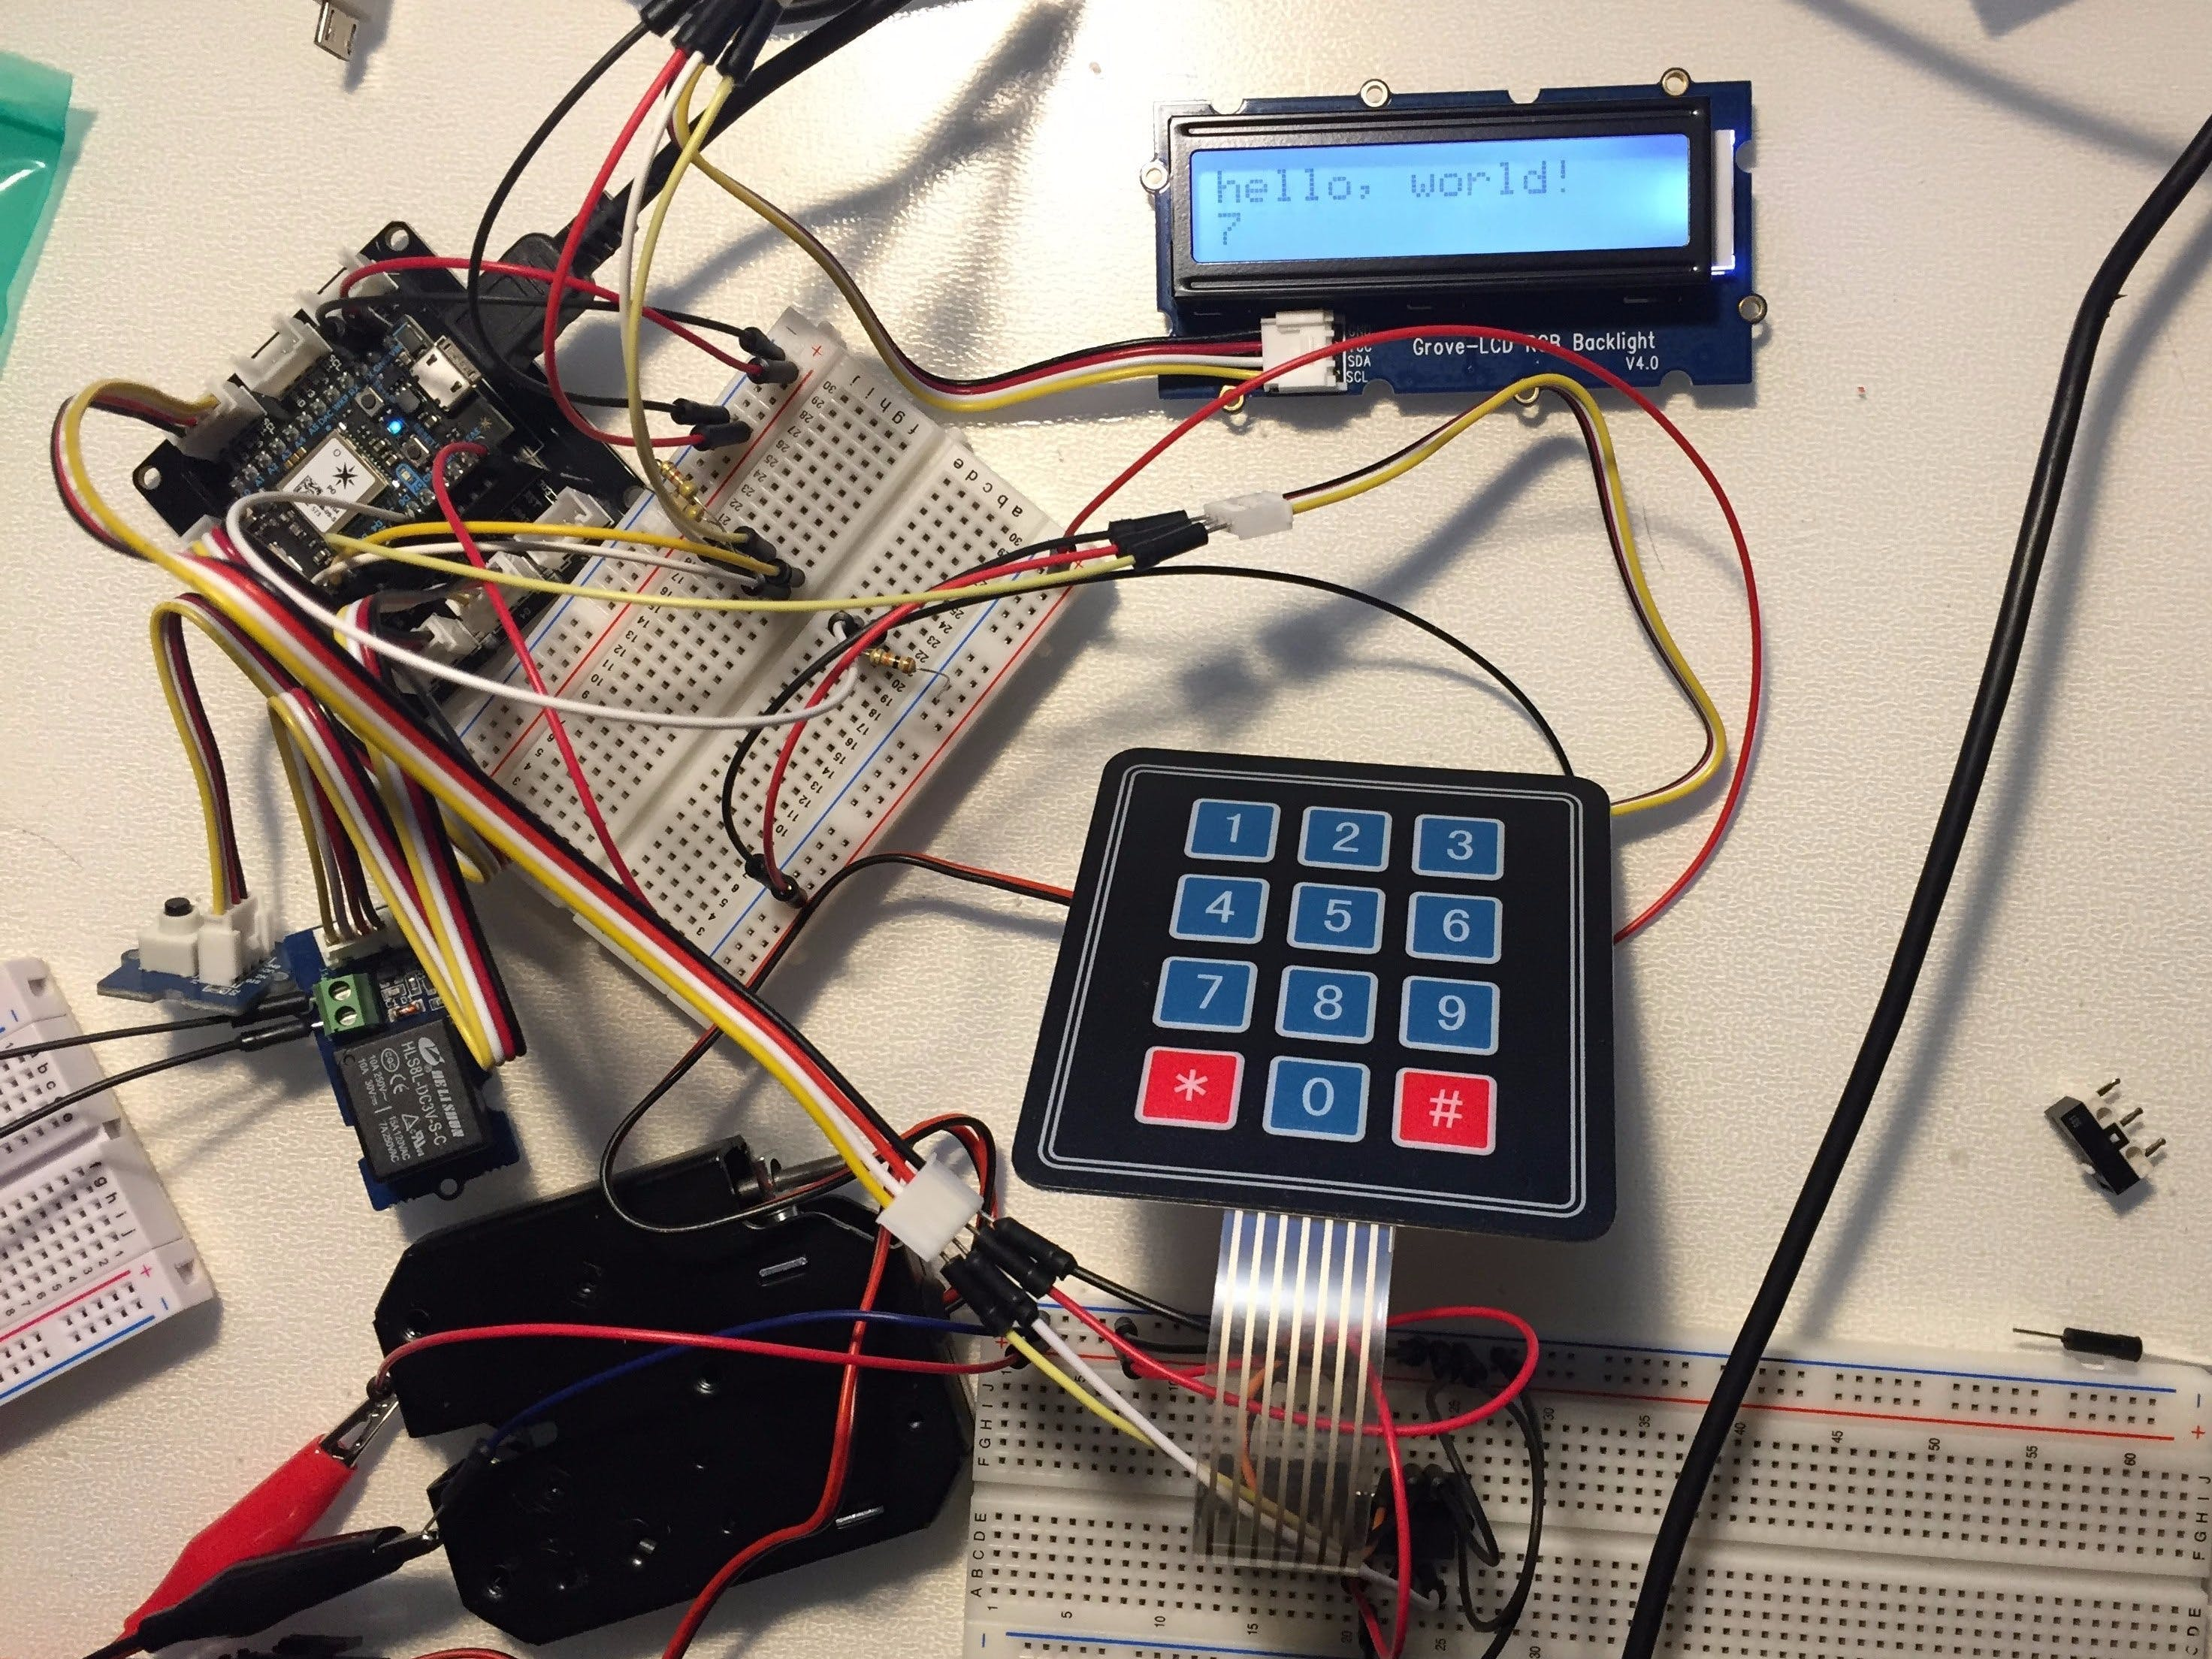 Particle Photon + Matrix Keypad + LCD using I2C